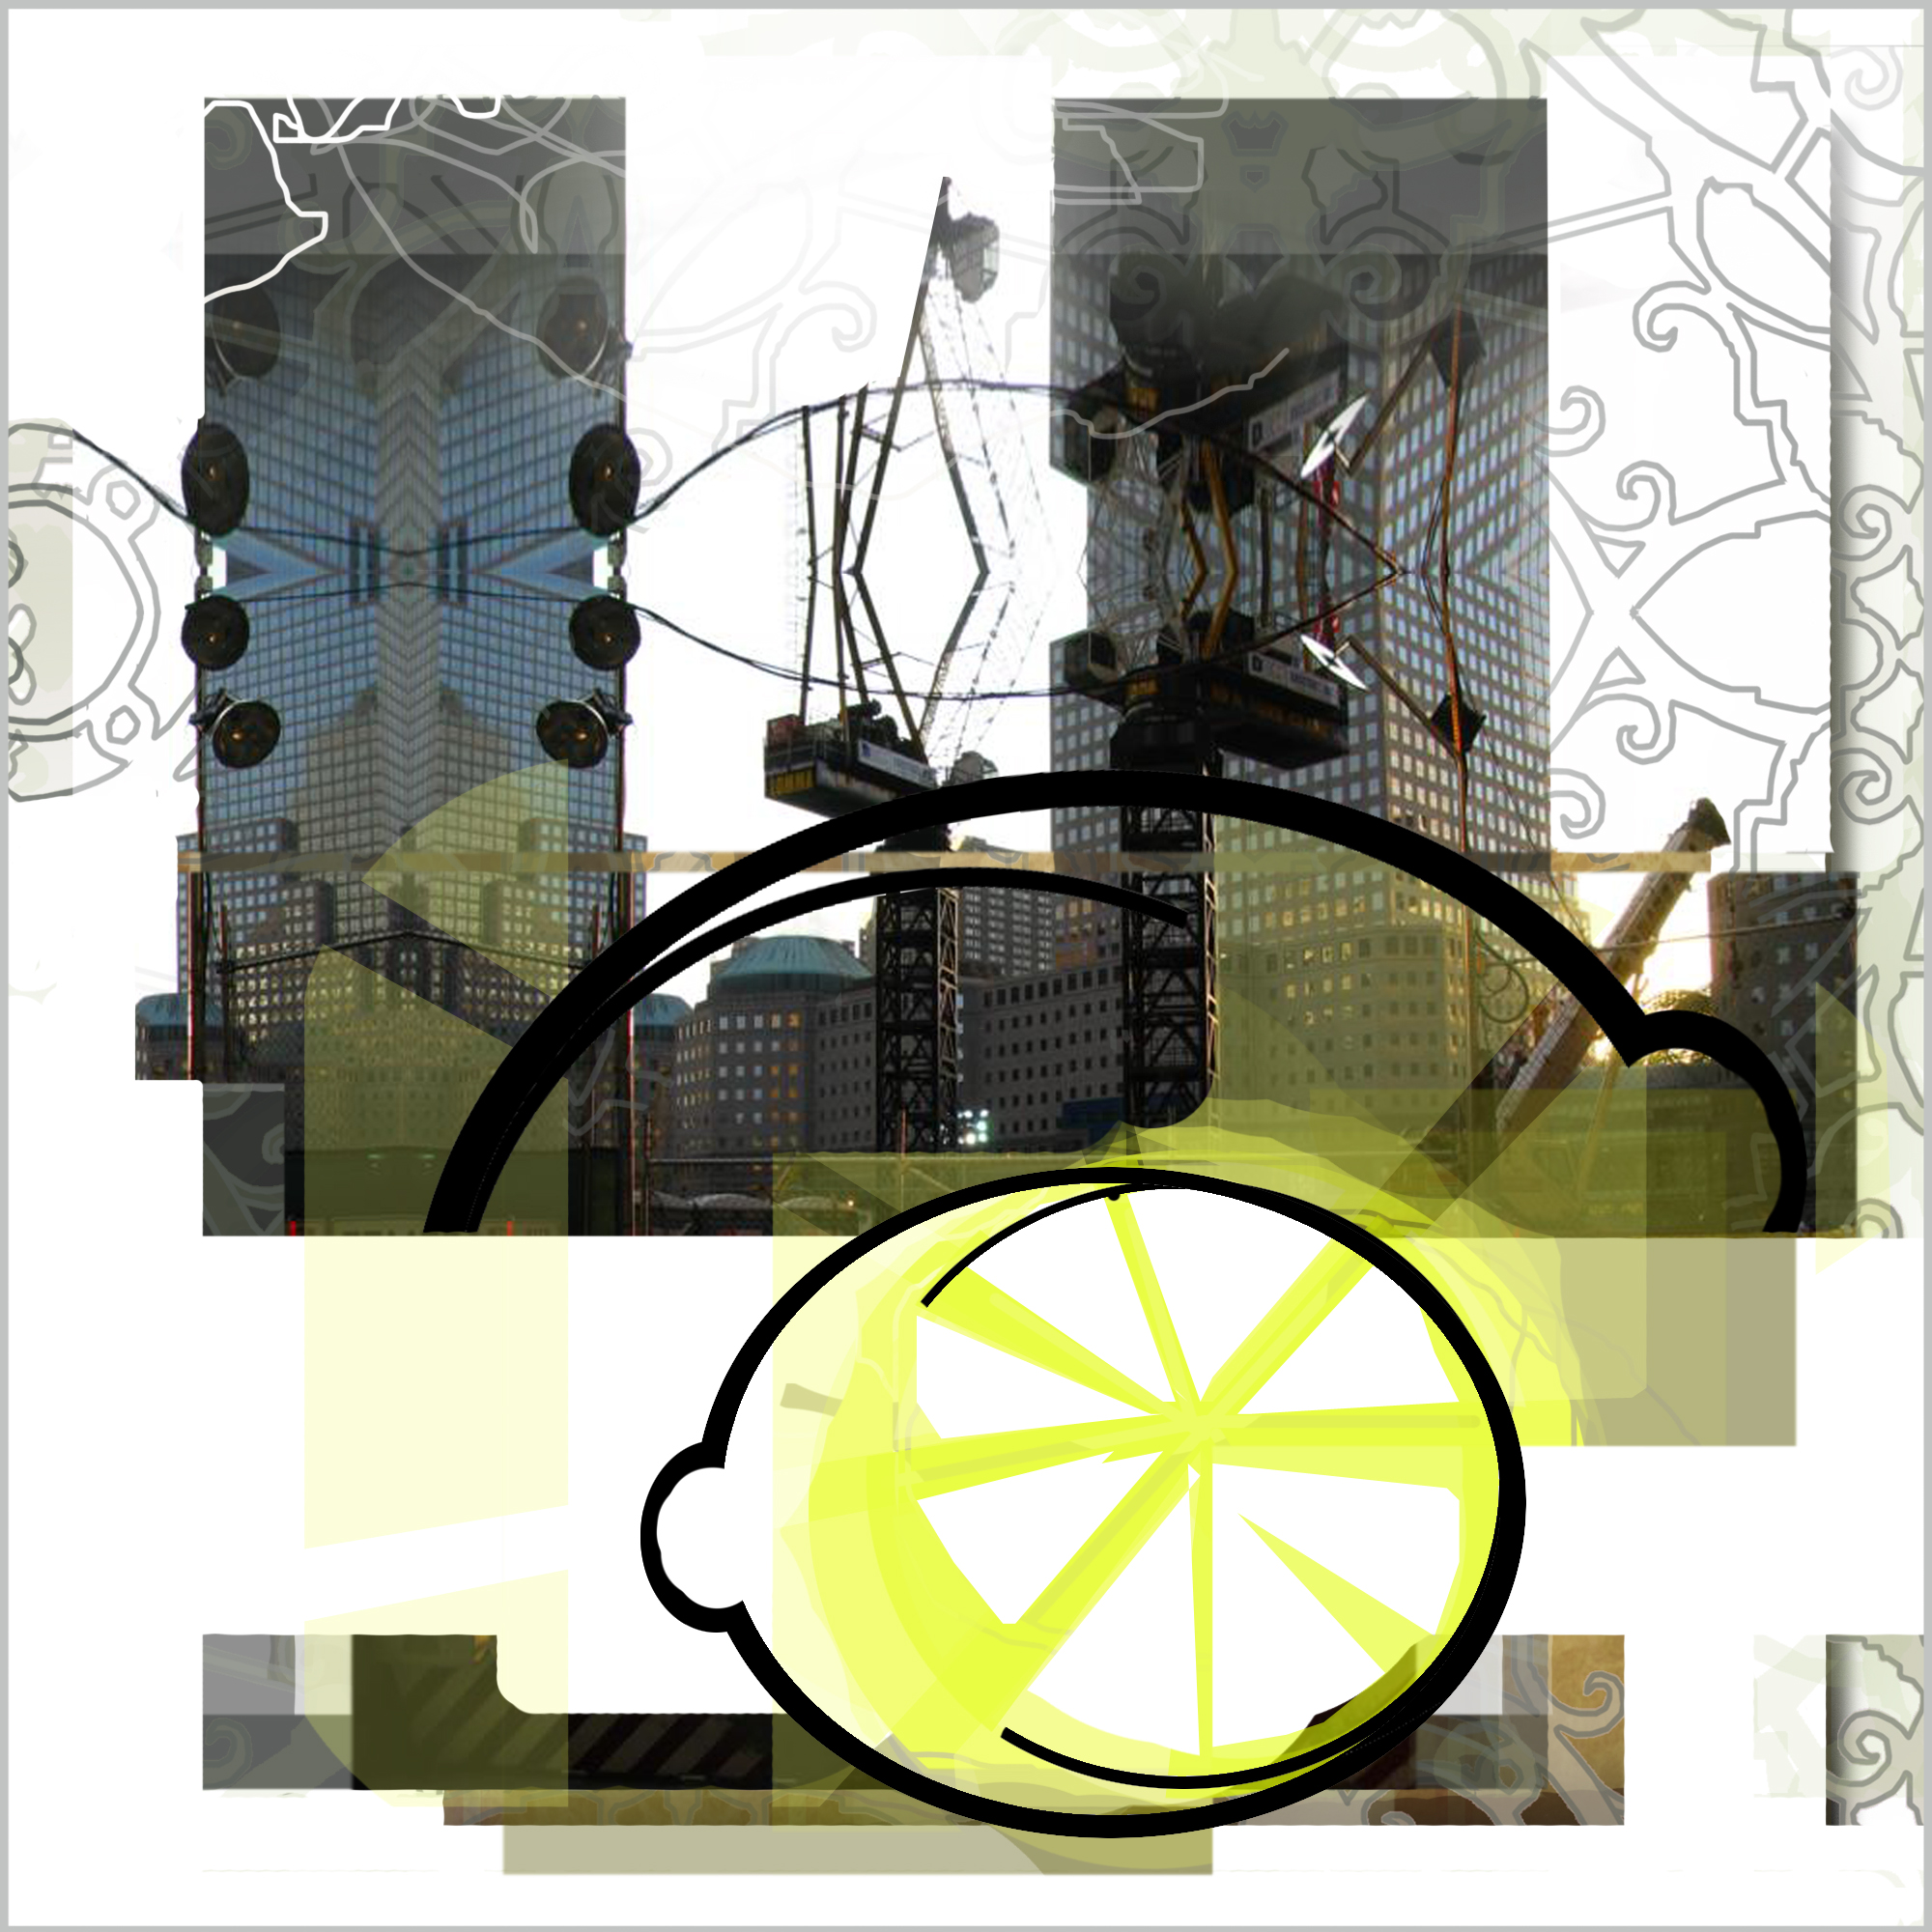 r.kv.r.y quarterly , Spring 2011 (Morgan Maurer)